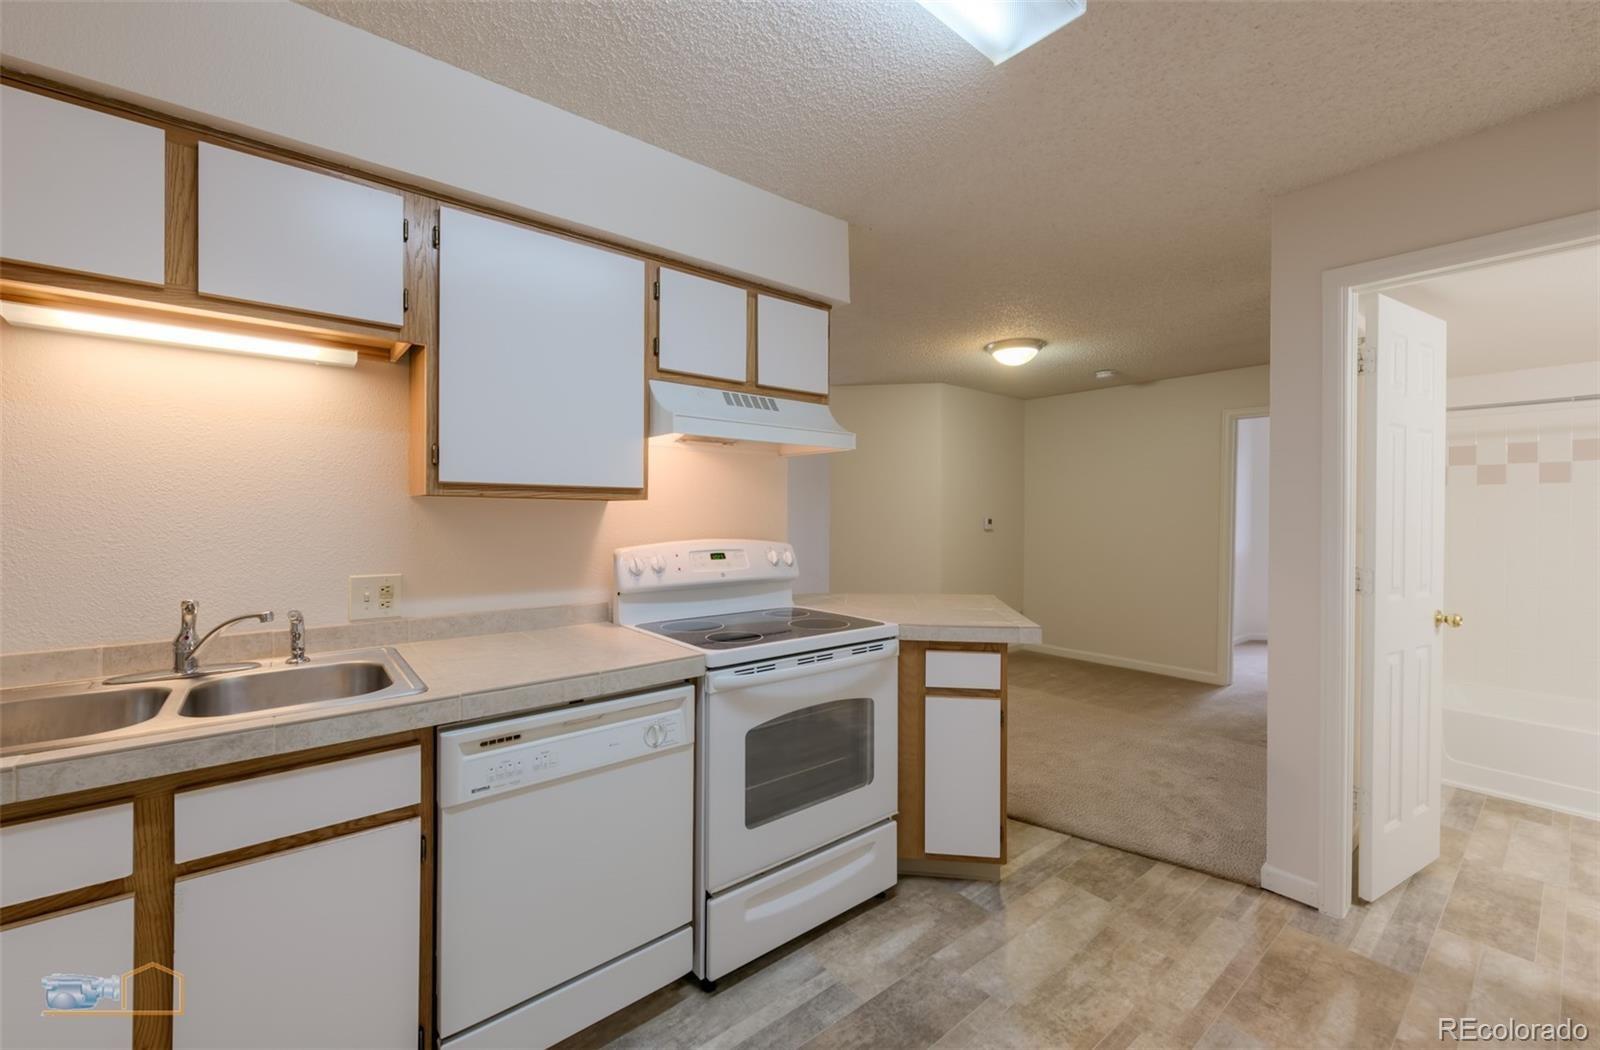 MLS# 6046314 - 11 - 4870 Twin Lakes Road #8, Boulder, CO 80301